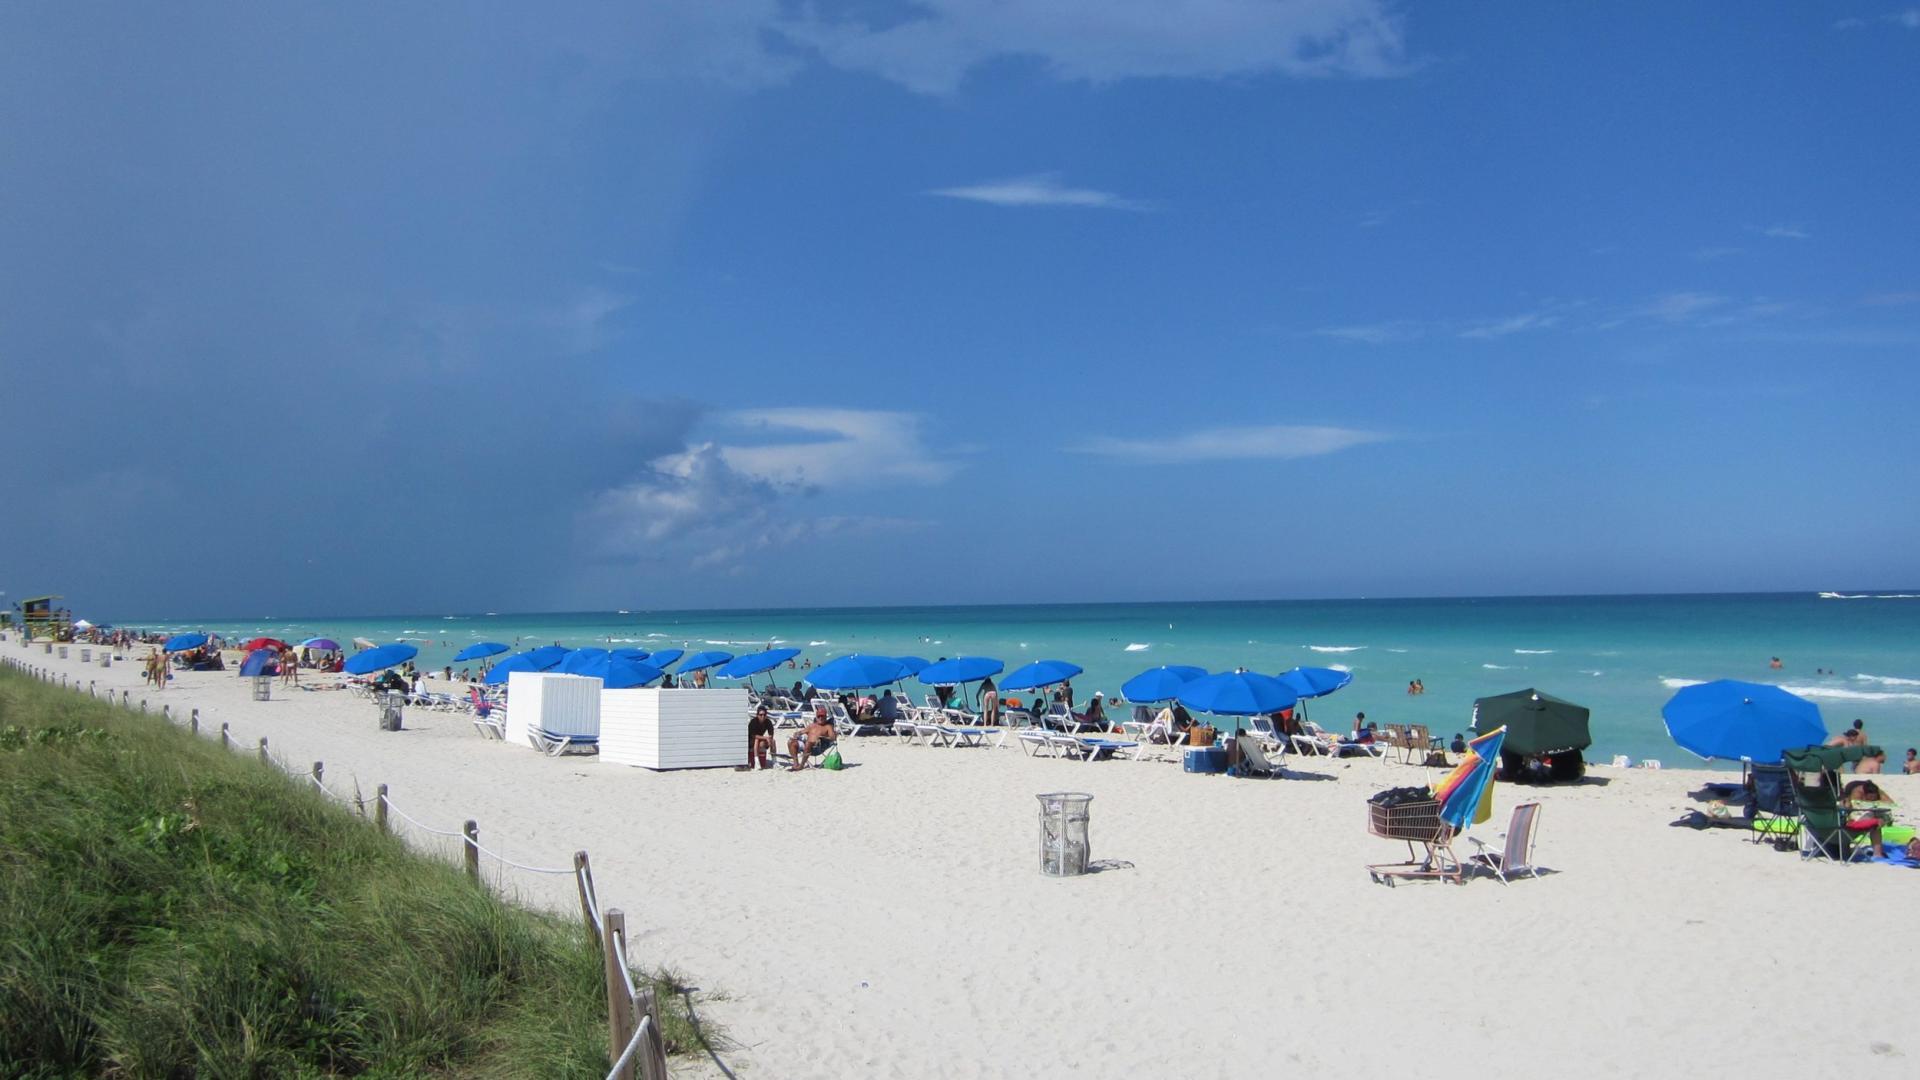 South Beach Miami Florida Hd Wallpaper South Beach Miami Florida 1920x1080